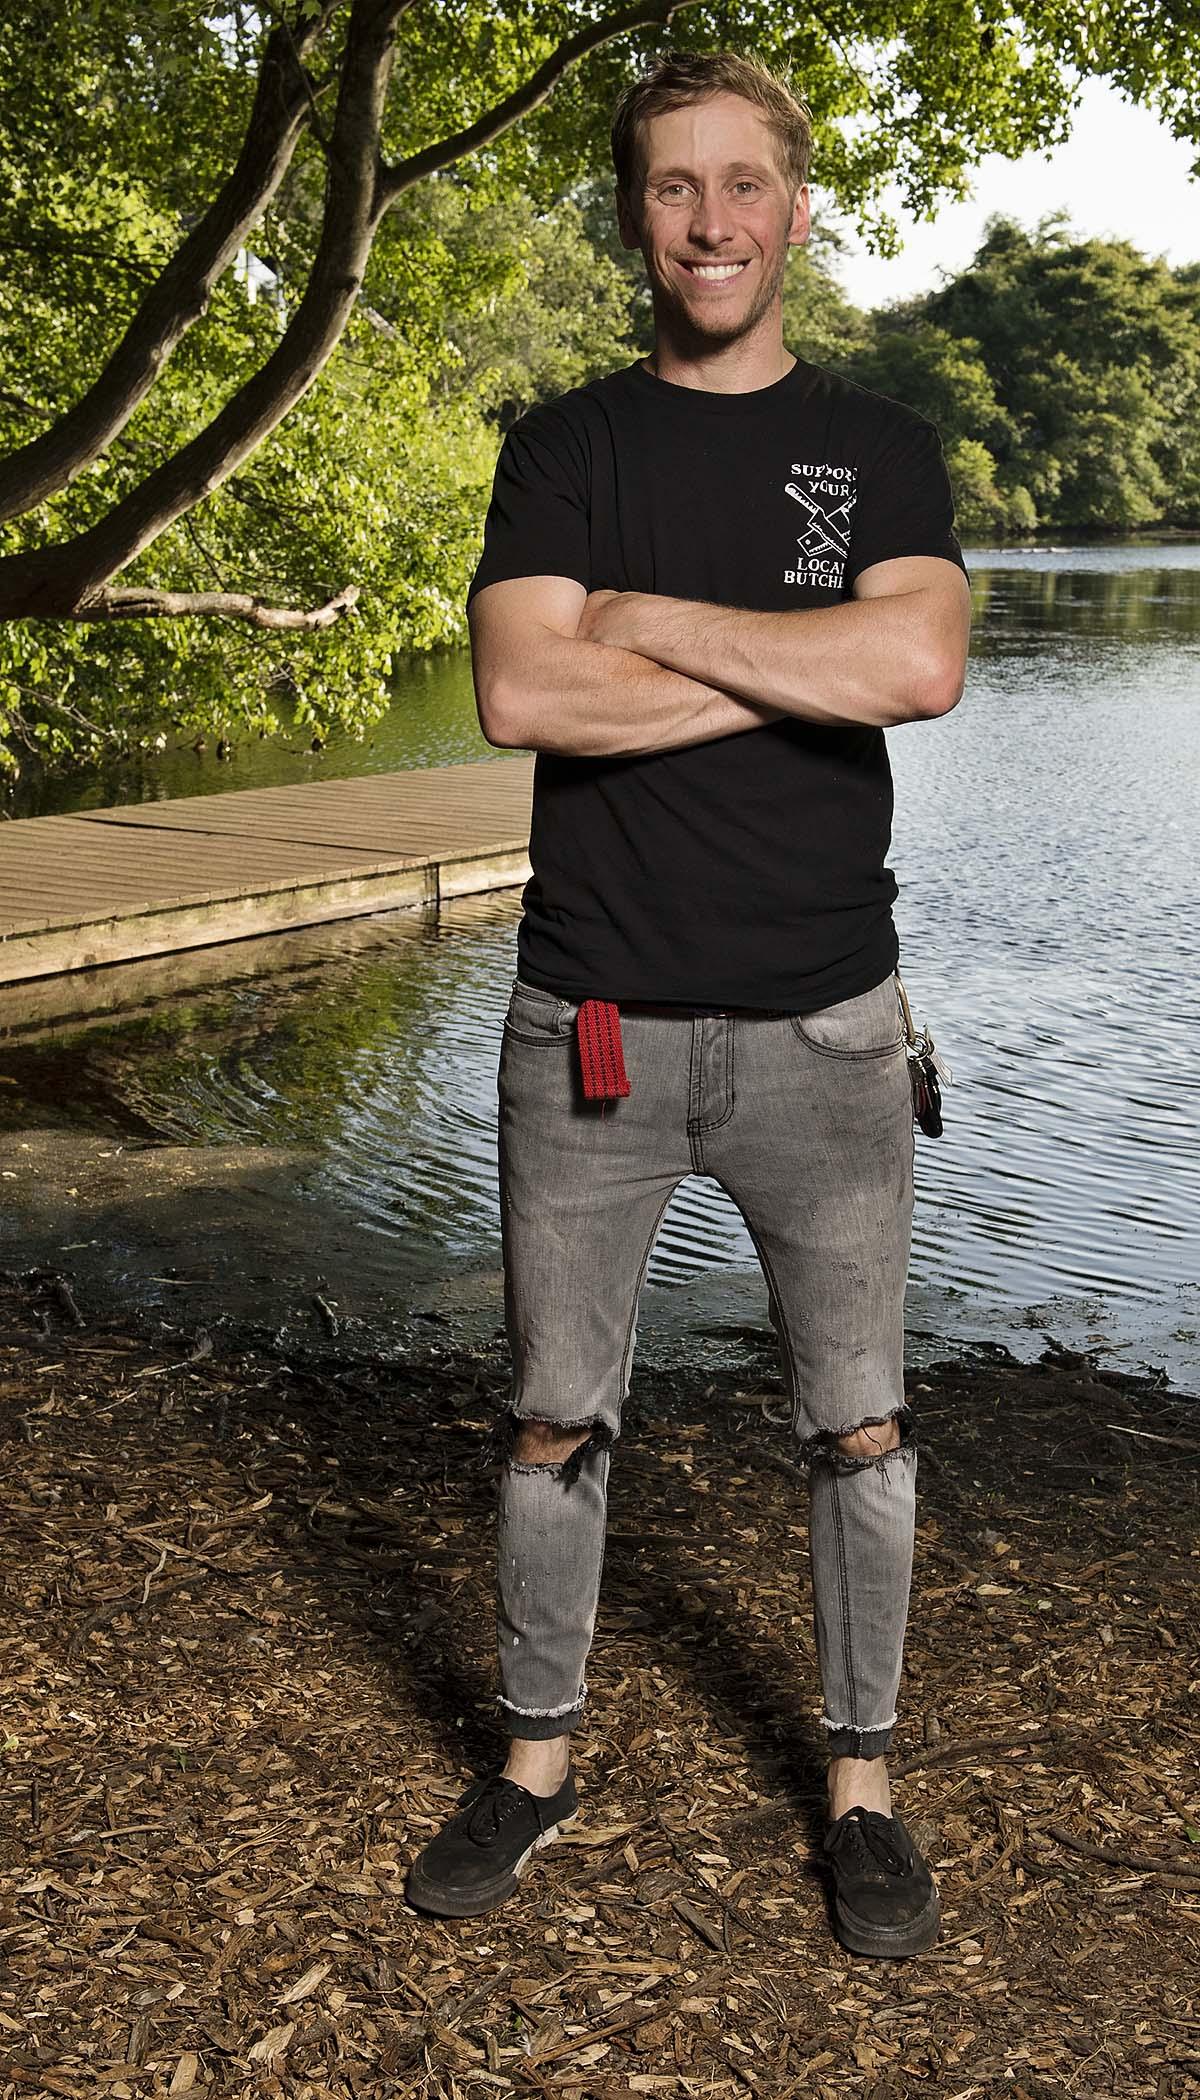 Justin-Demarco-of-Justins-chop-shop